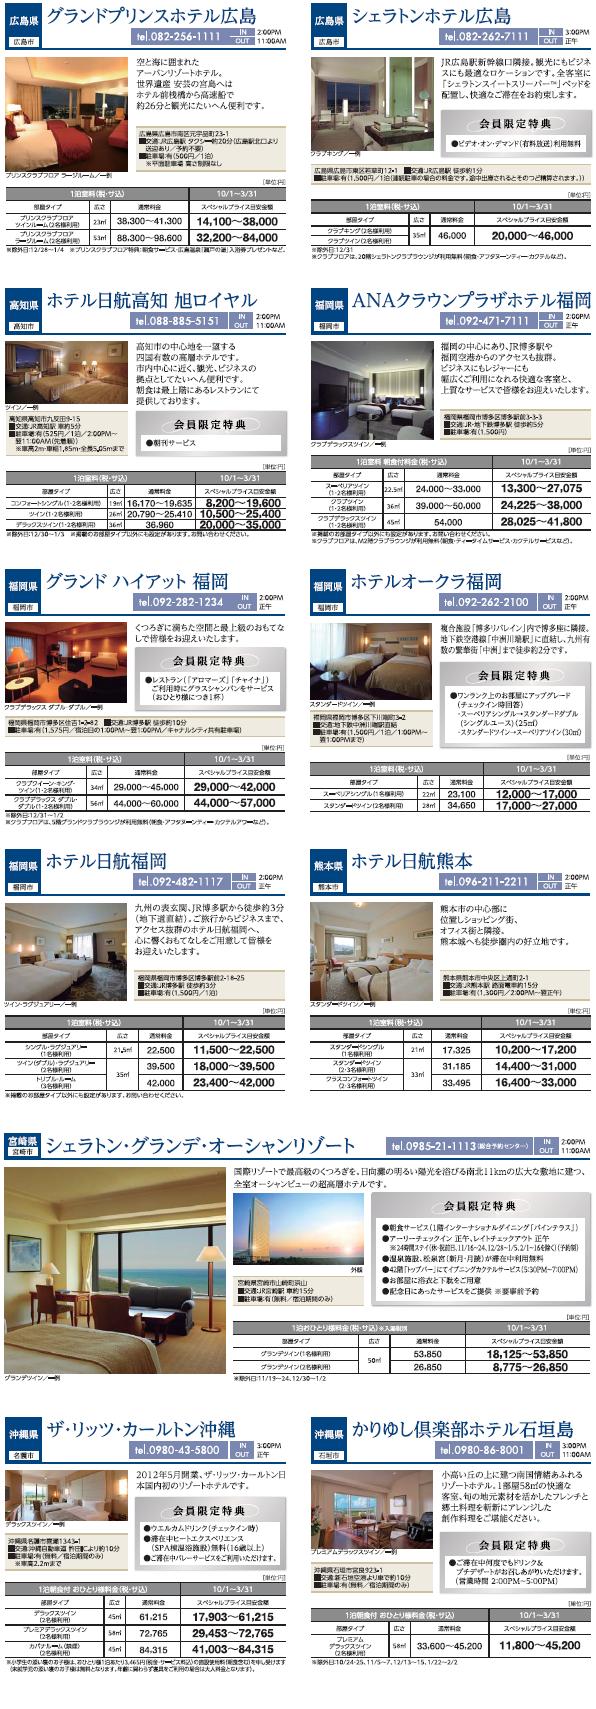 special_price_ plan1309 08